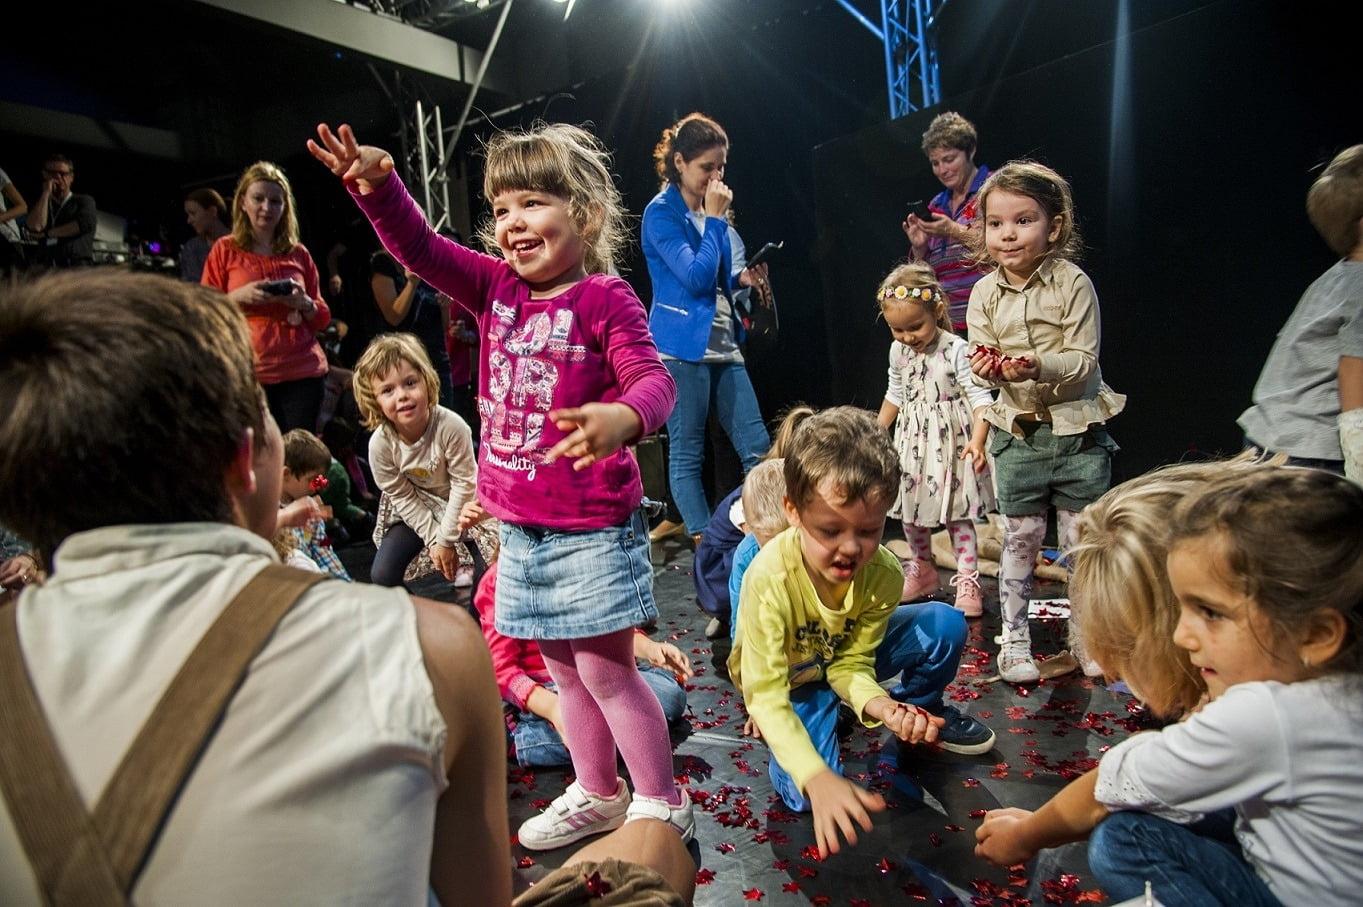 Zbor_prin_povesti_Teatrul_Ion_Creanga_6.10.2015_by_Alexandra_Jitariuc_92